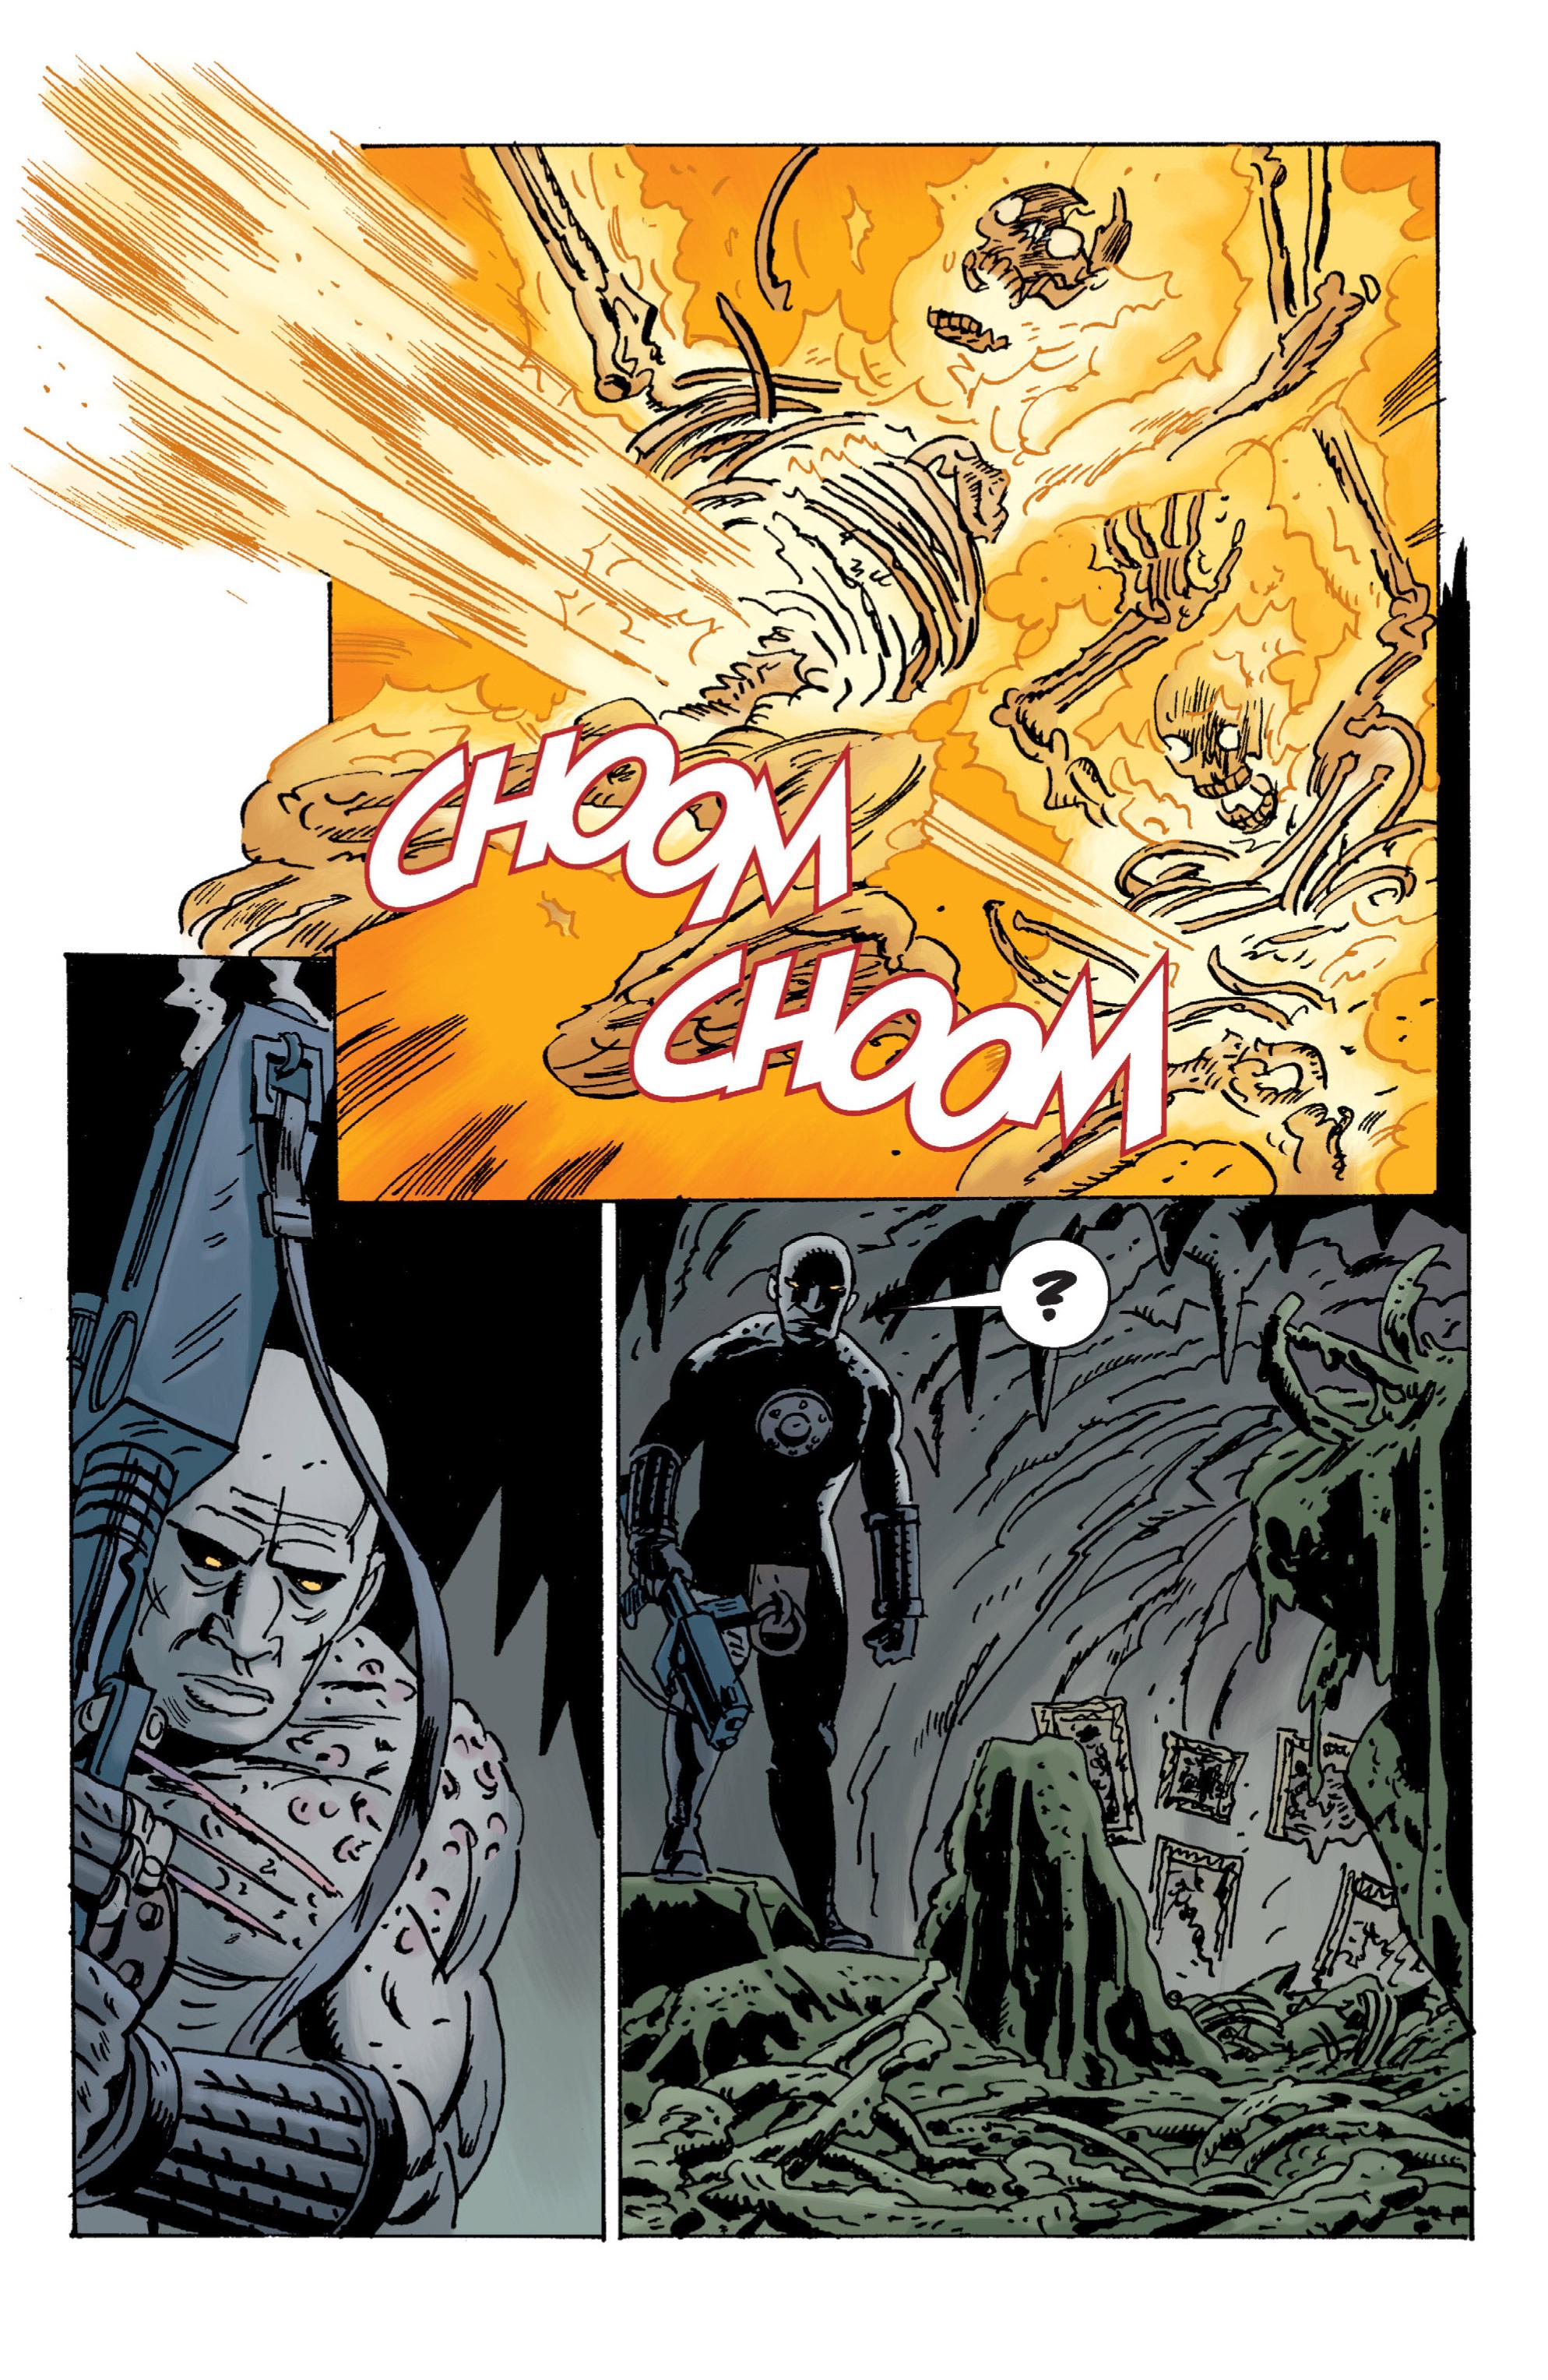 Read online B.P.R.D. (2003) comic -  Issue # TPB 12 - 30